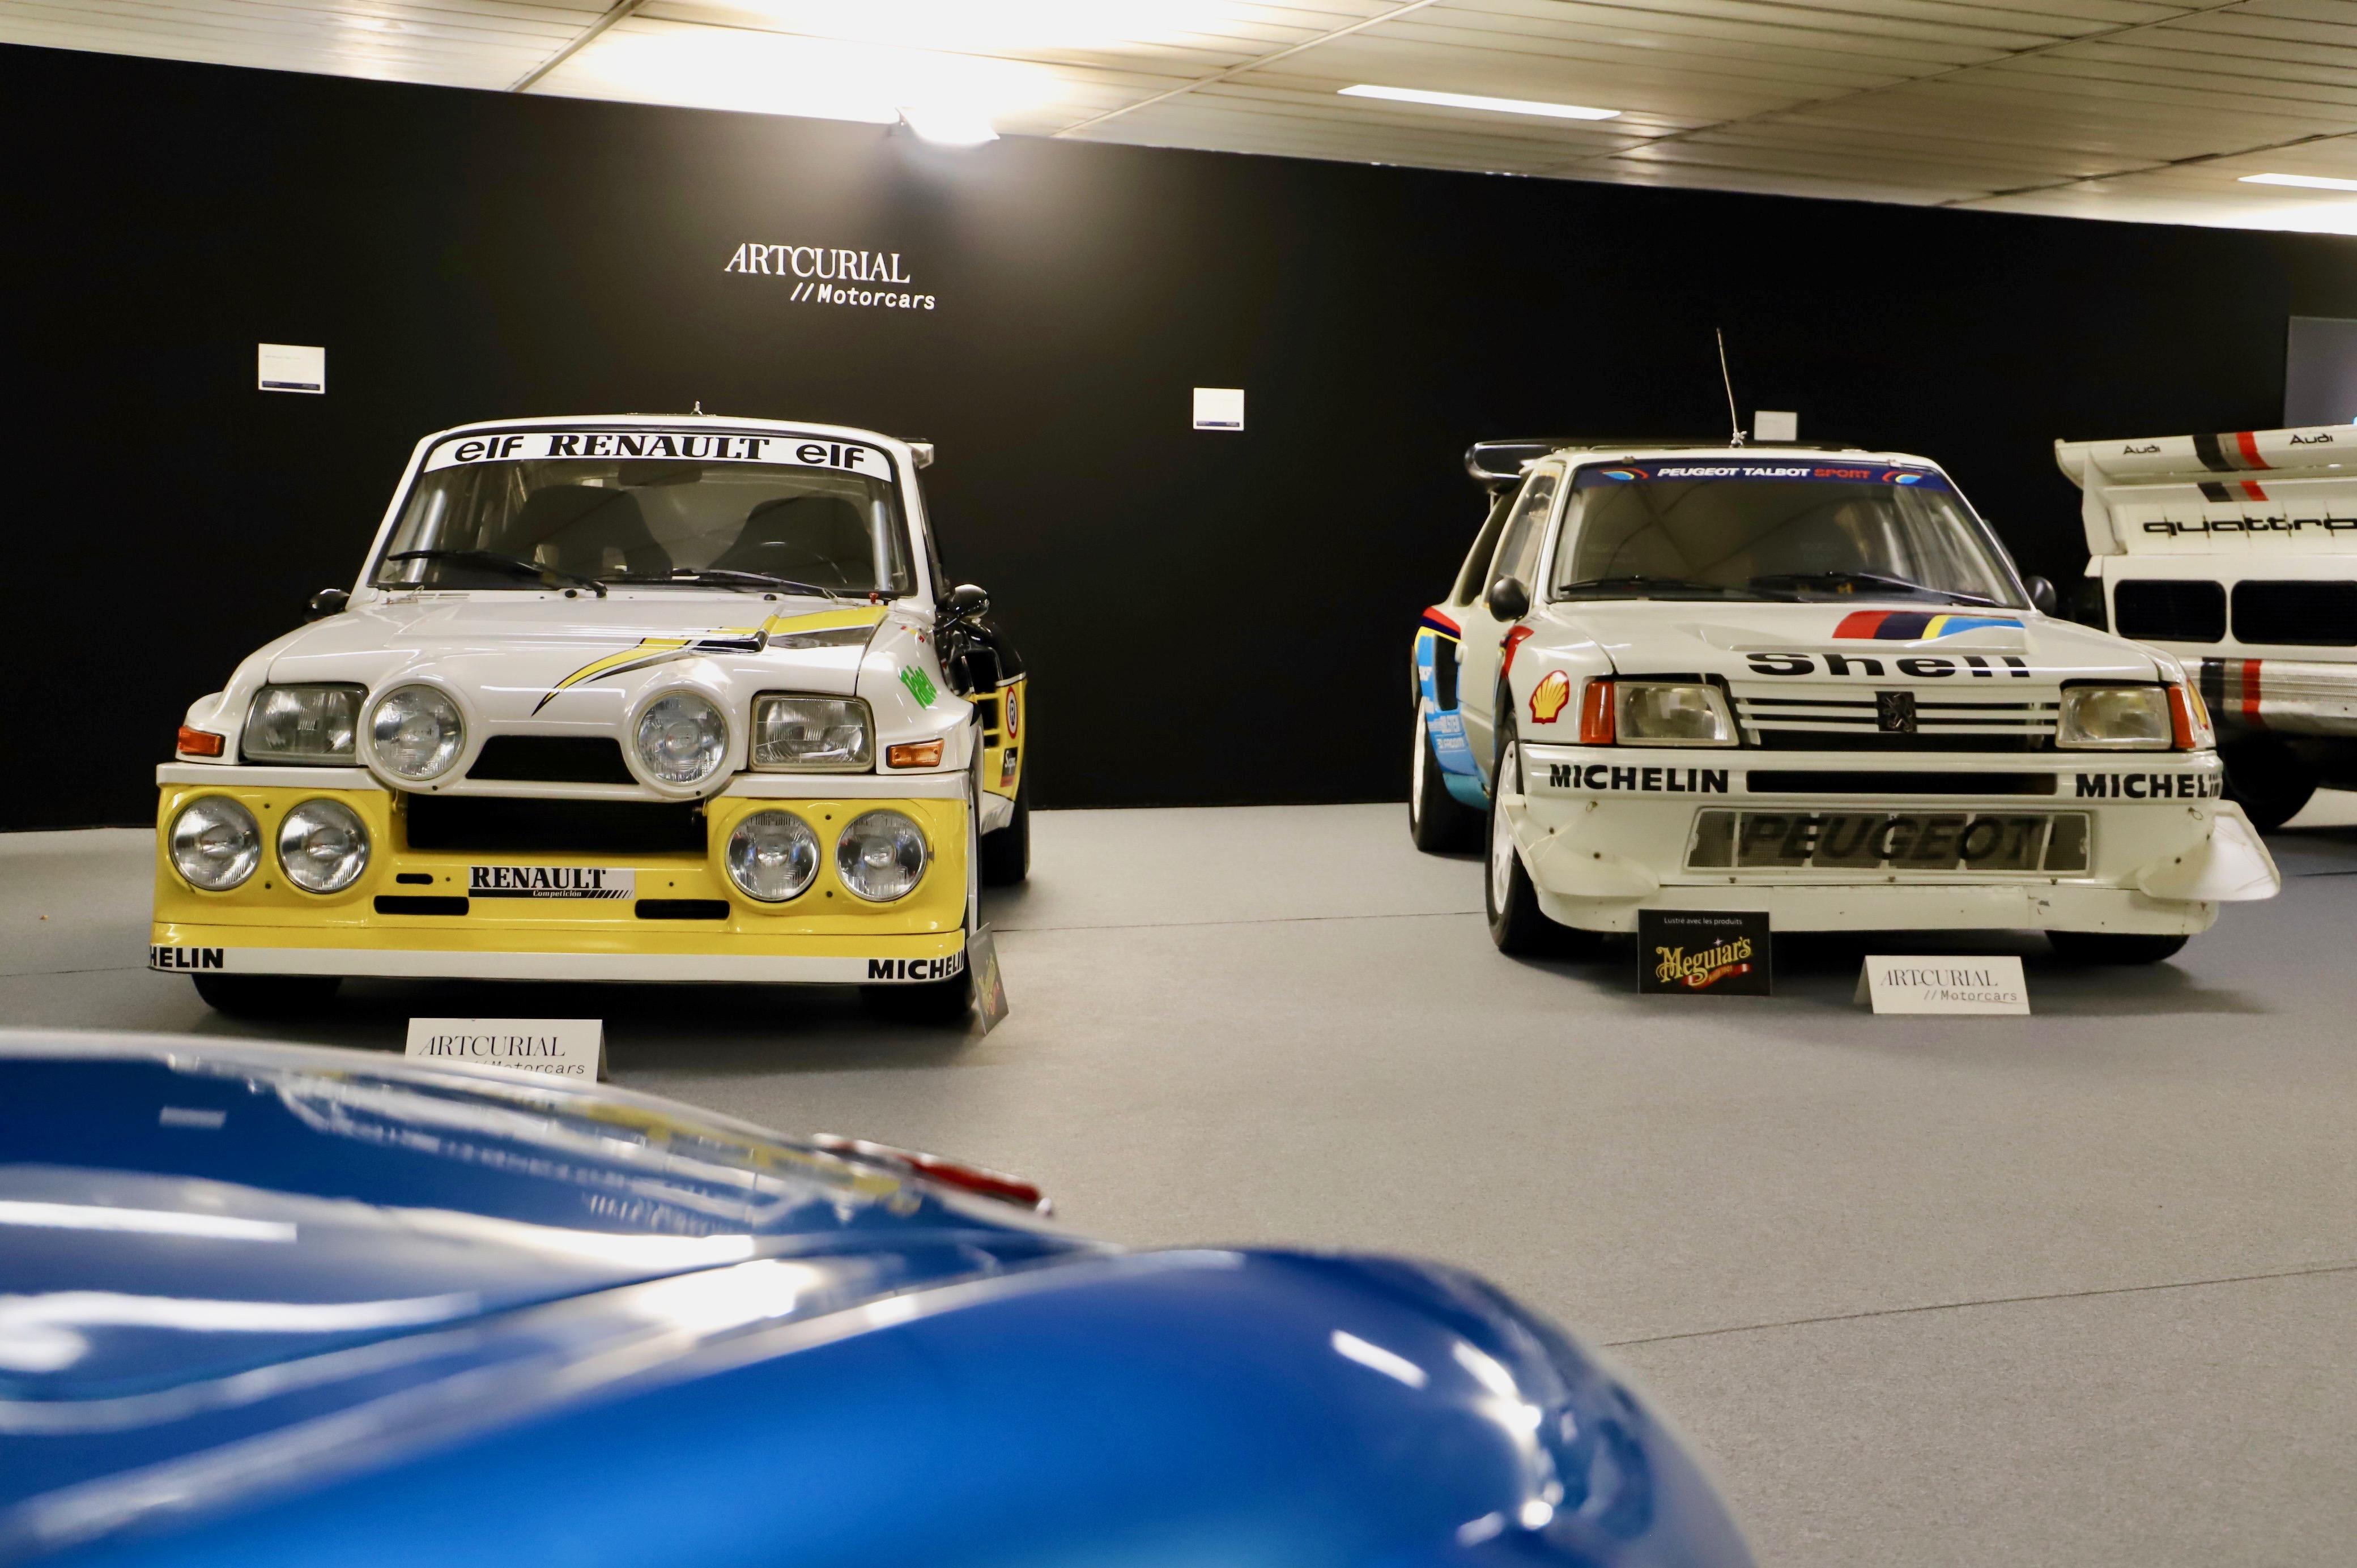 Renault 5 Maxi Turbo 1985 -vs- Peugeot 205 Turbo 16 Evolution 2 1985 - La Parisienne 2021 - Motorcars Artcurial - photo Ludo Ferrari